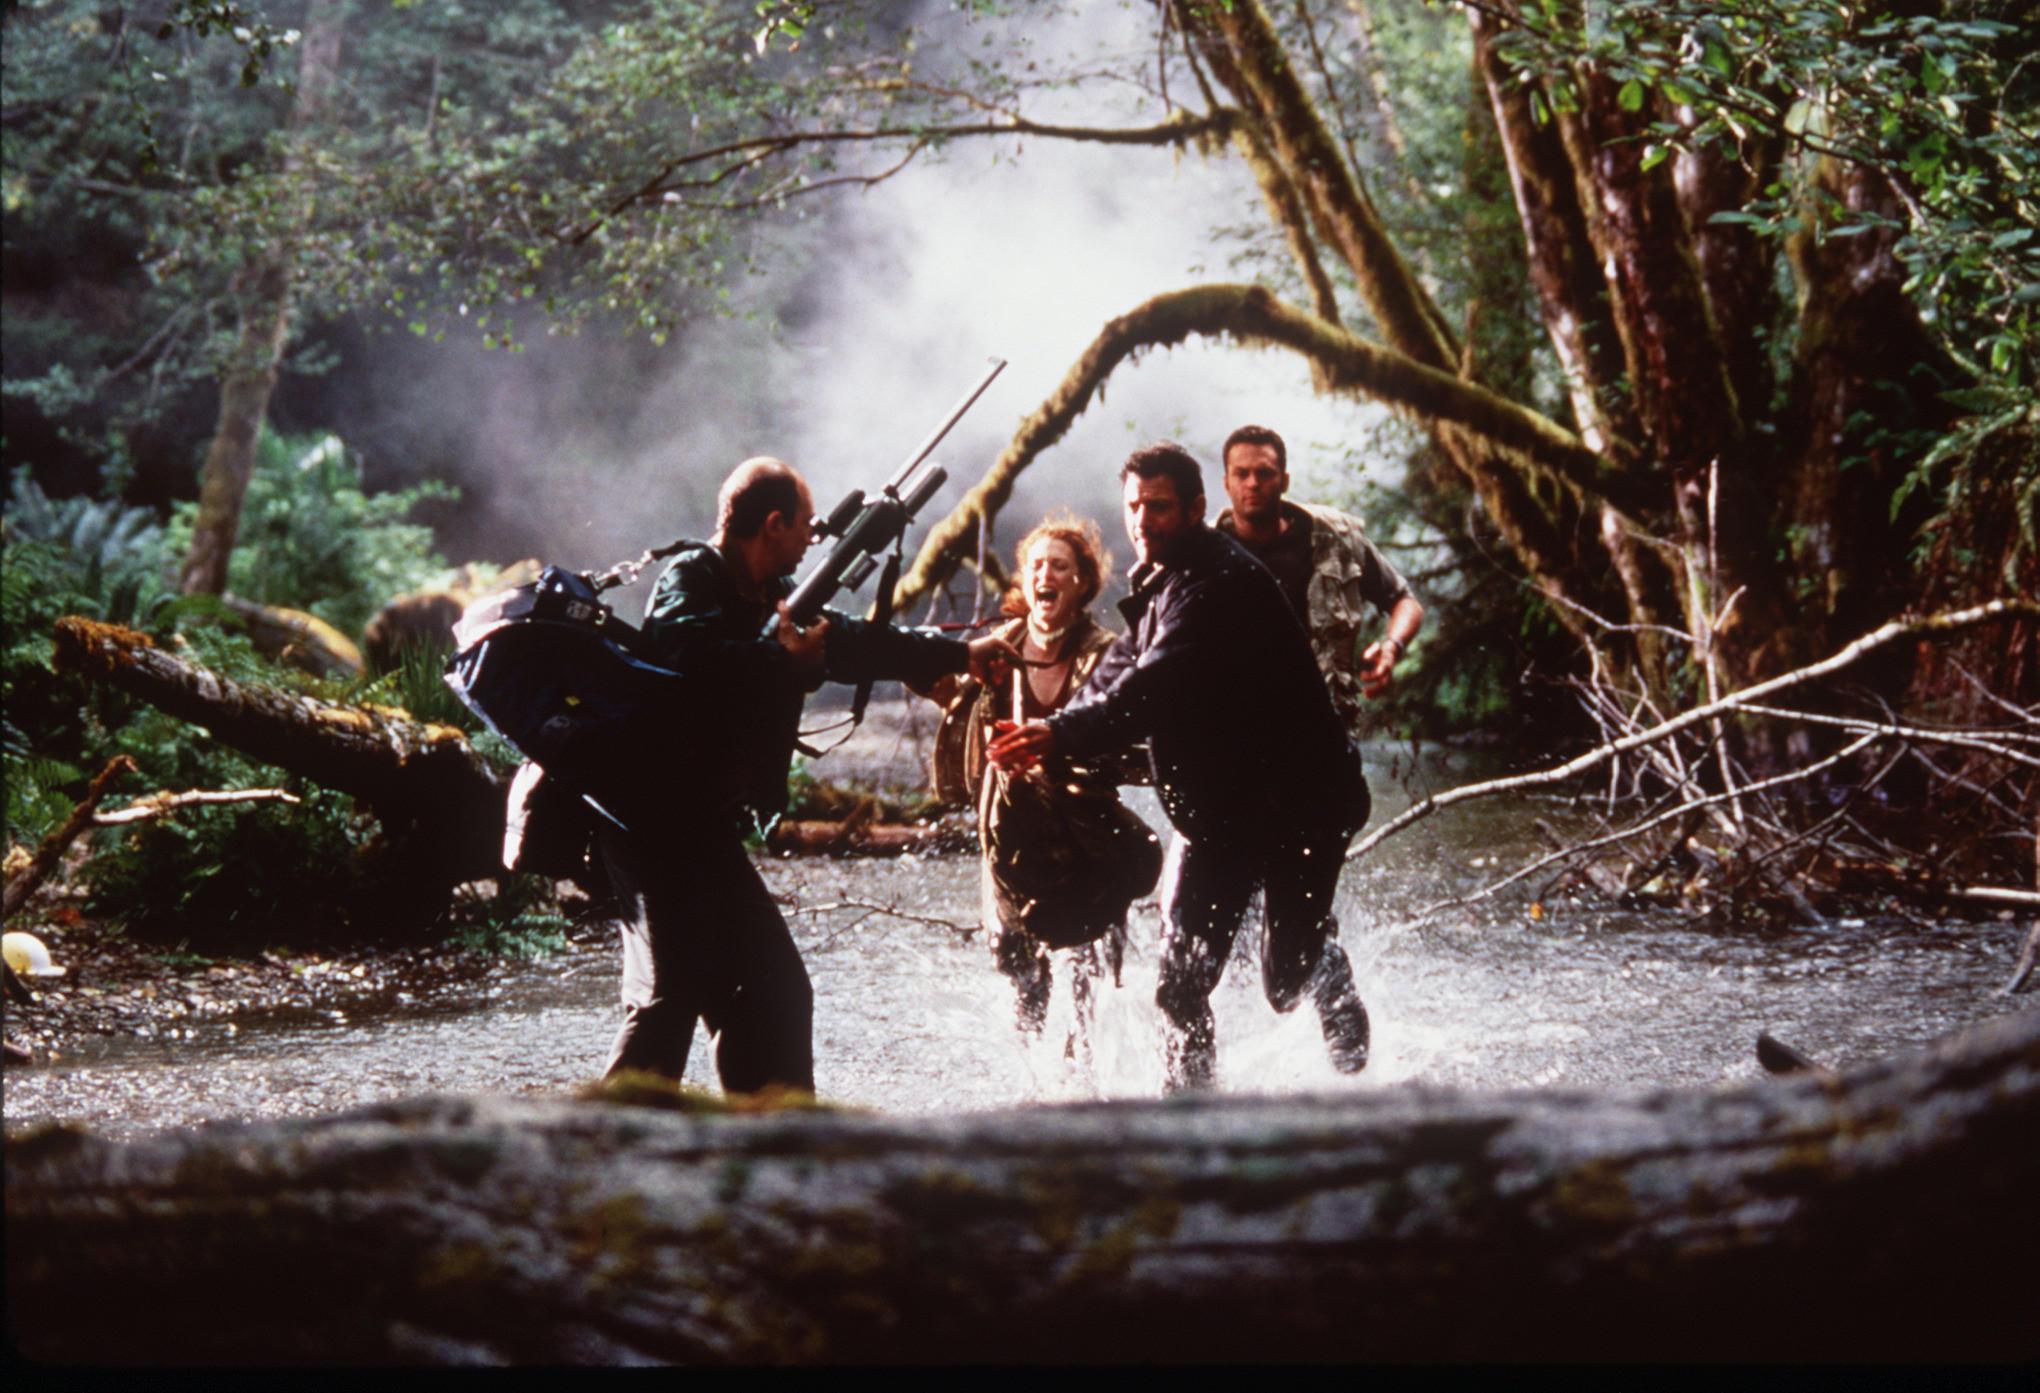 ''The Lost World: Jurassic Park'